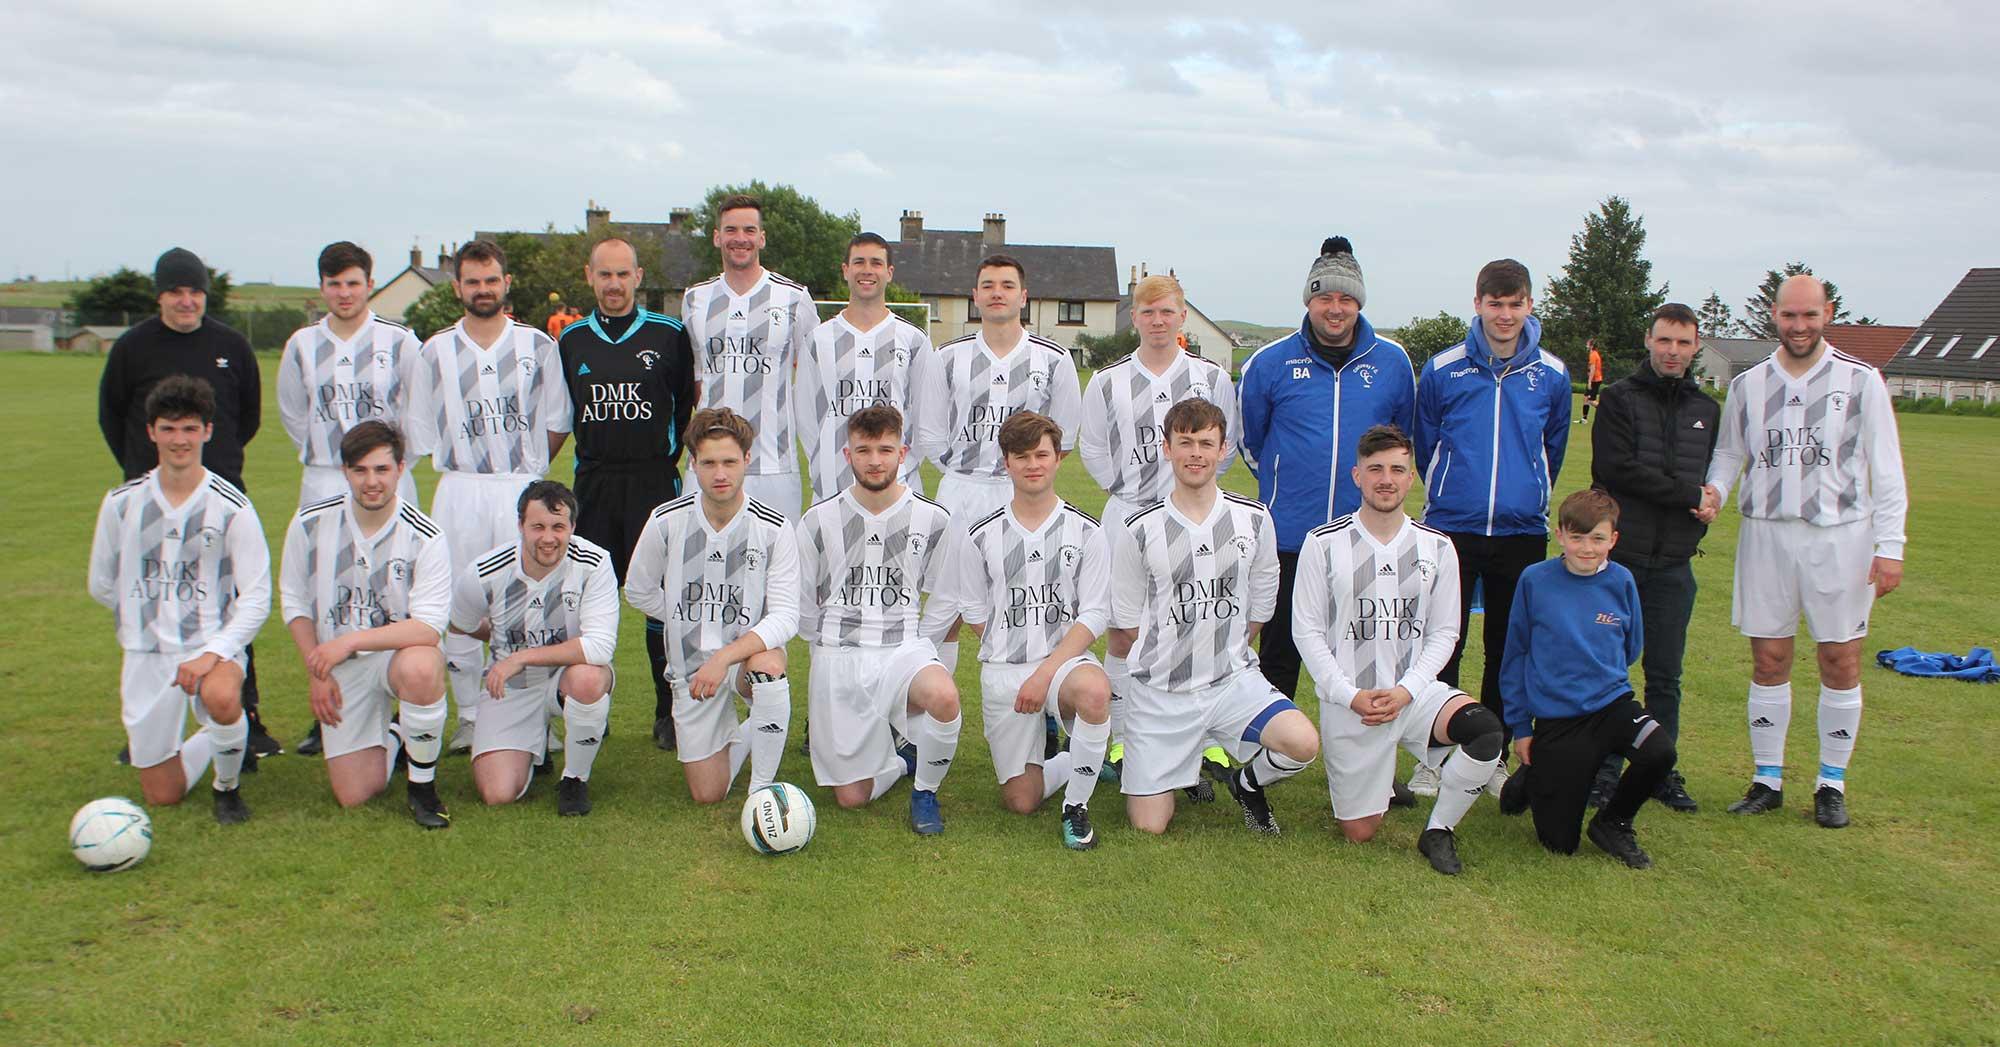 Carloway FC Team Photo 2021